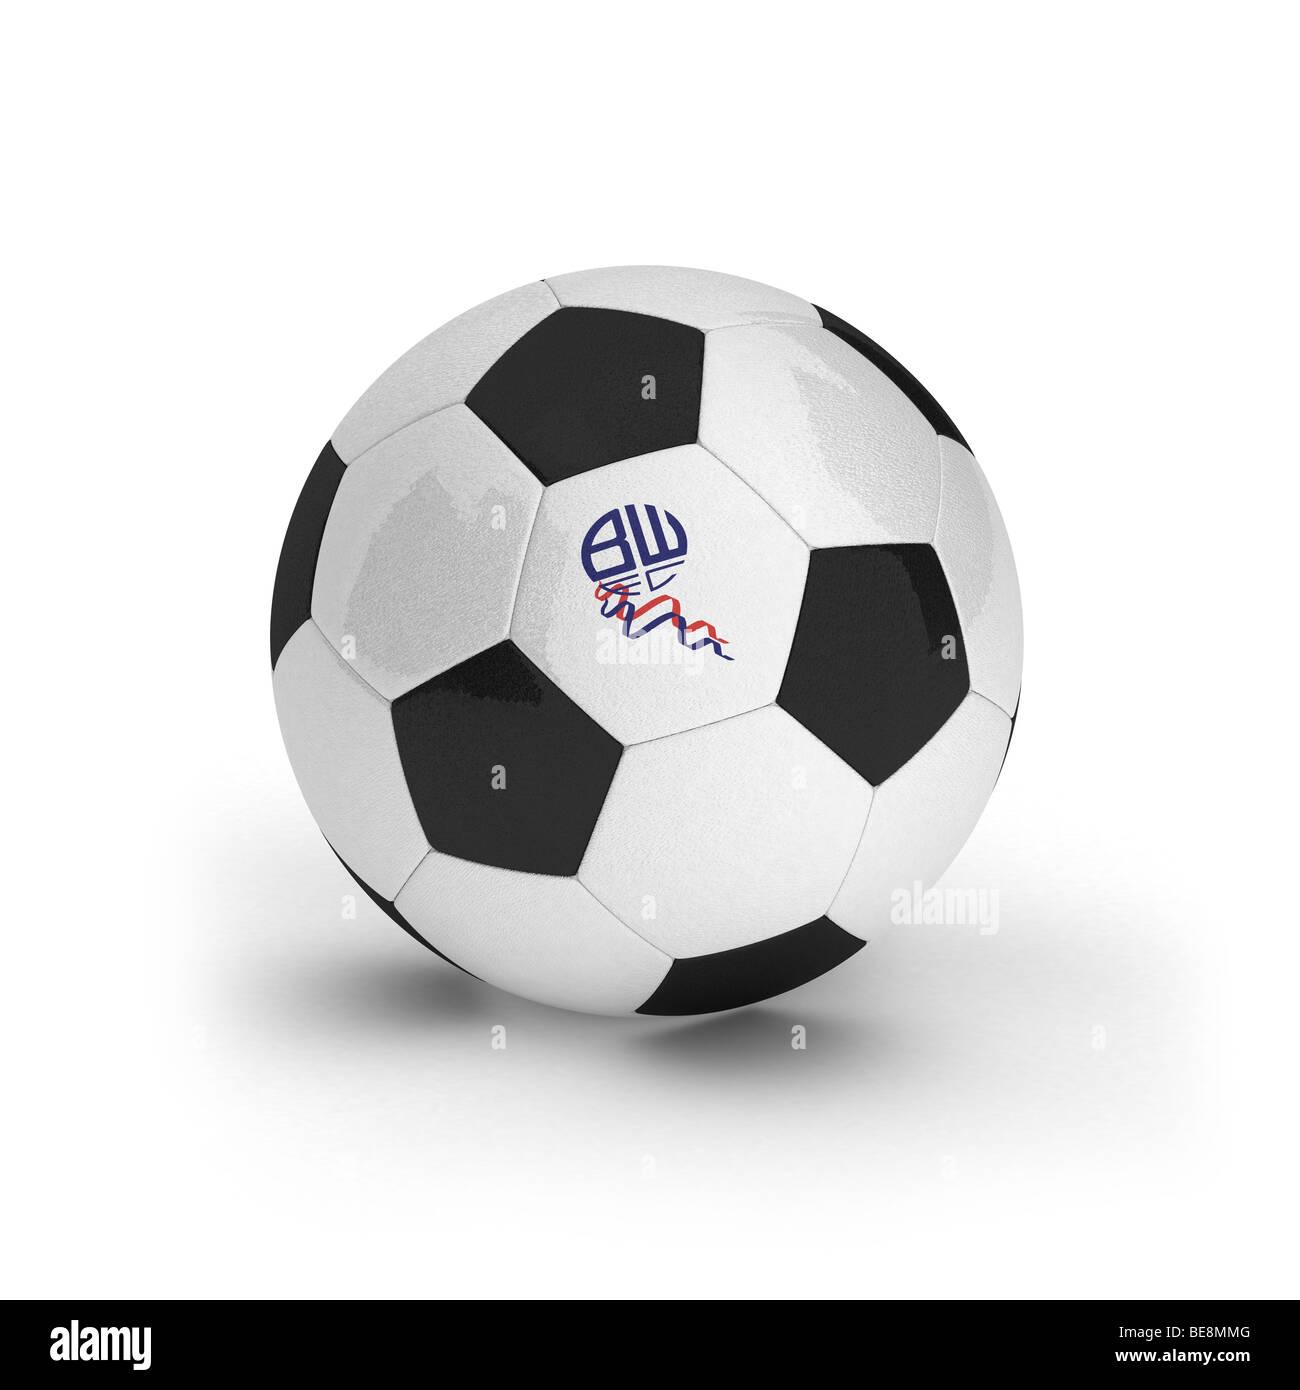 Bolton Wanderers Football Club emblem on a soccer ball - Stock Image